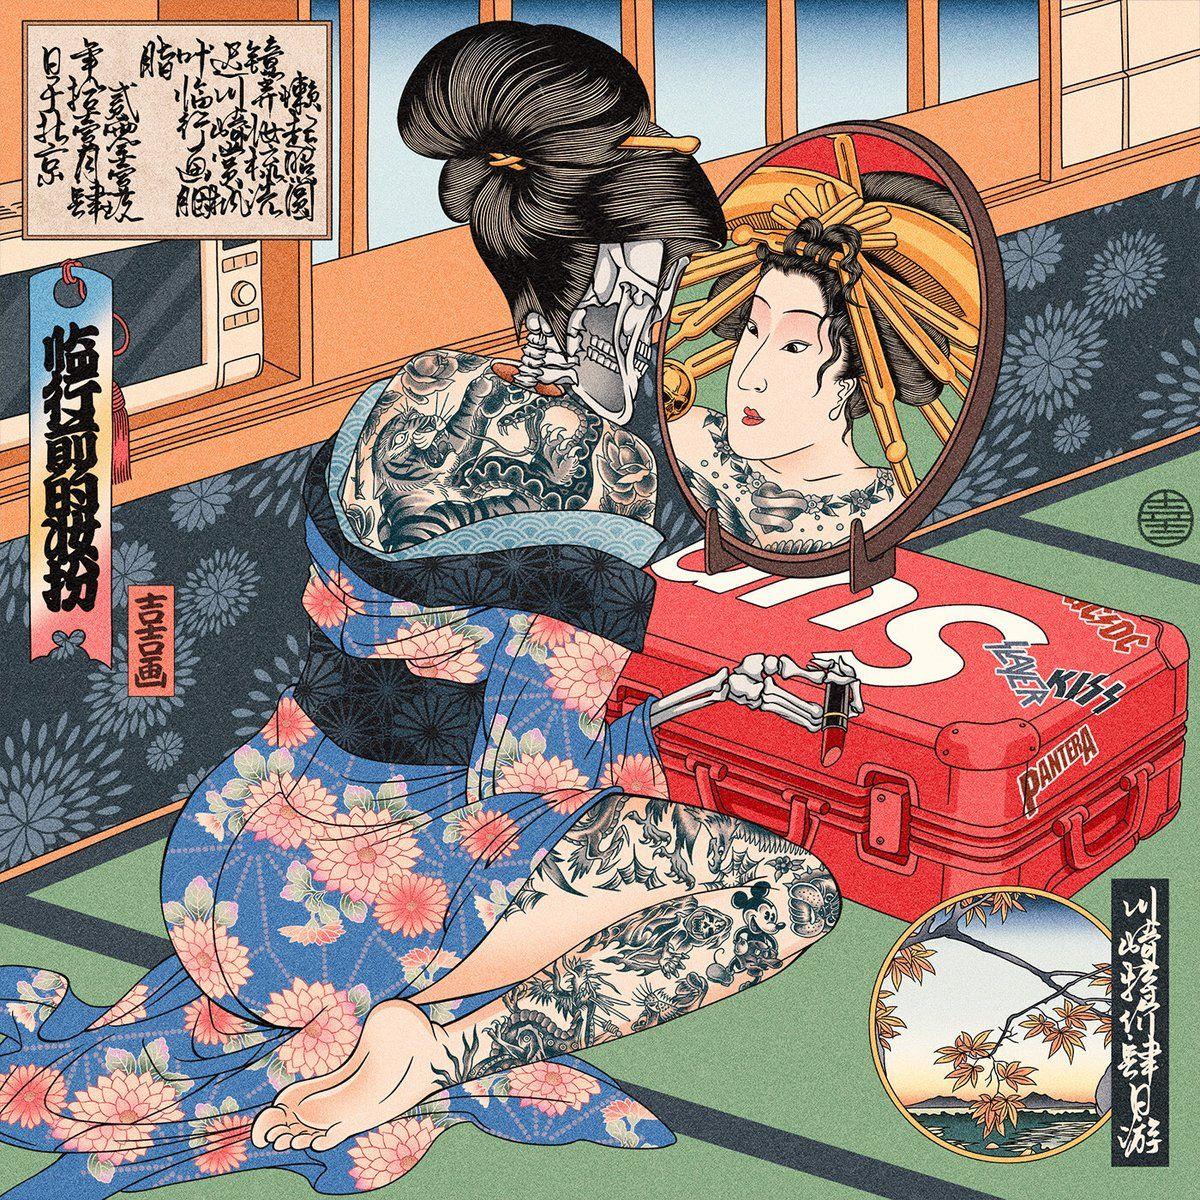 Modern Ukiyo E Illustrations In 2020 Ukiyoe Japanese Art Illustration